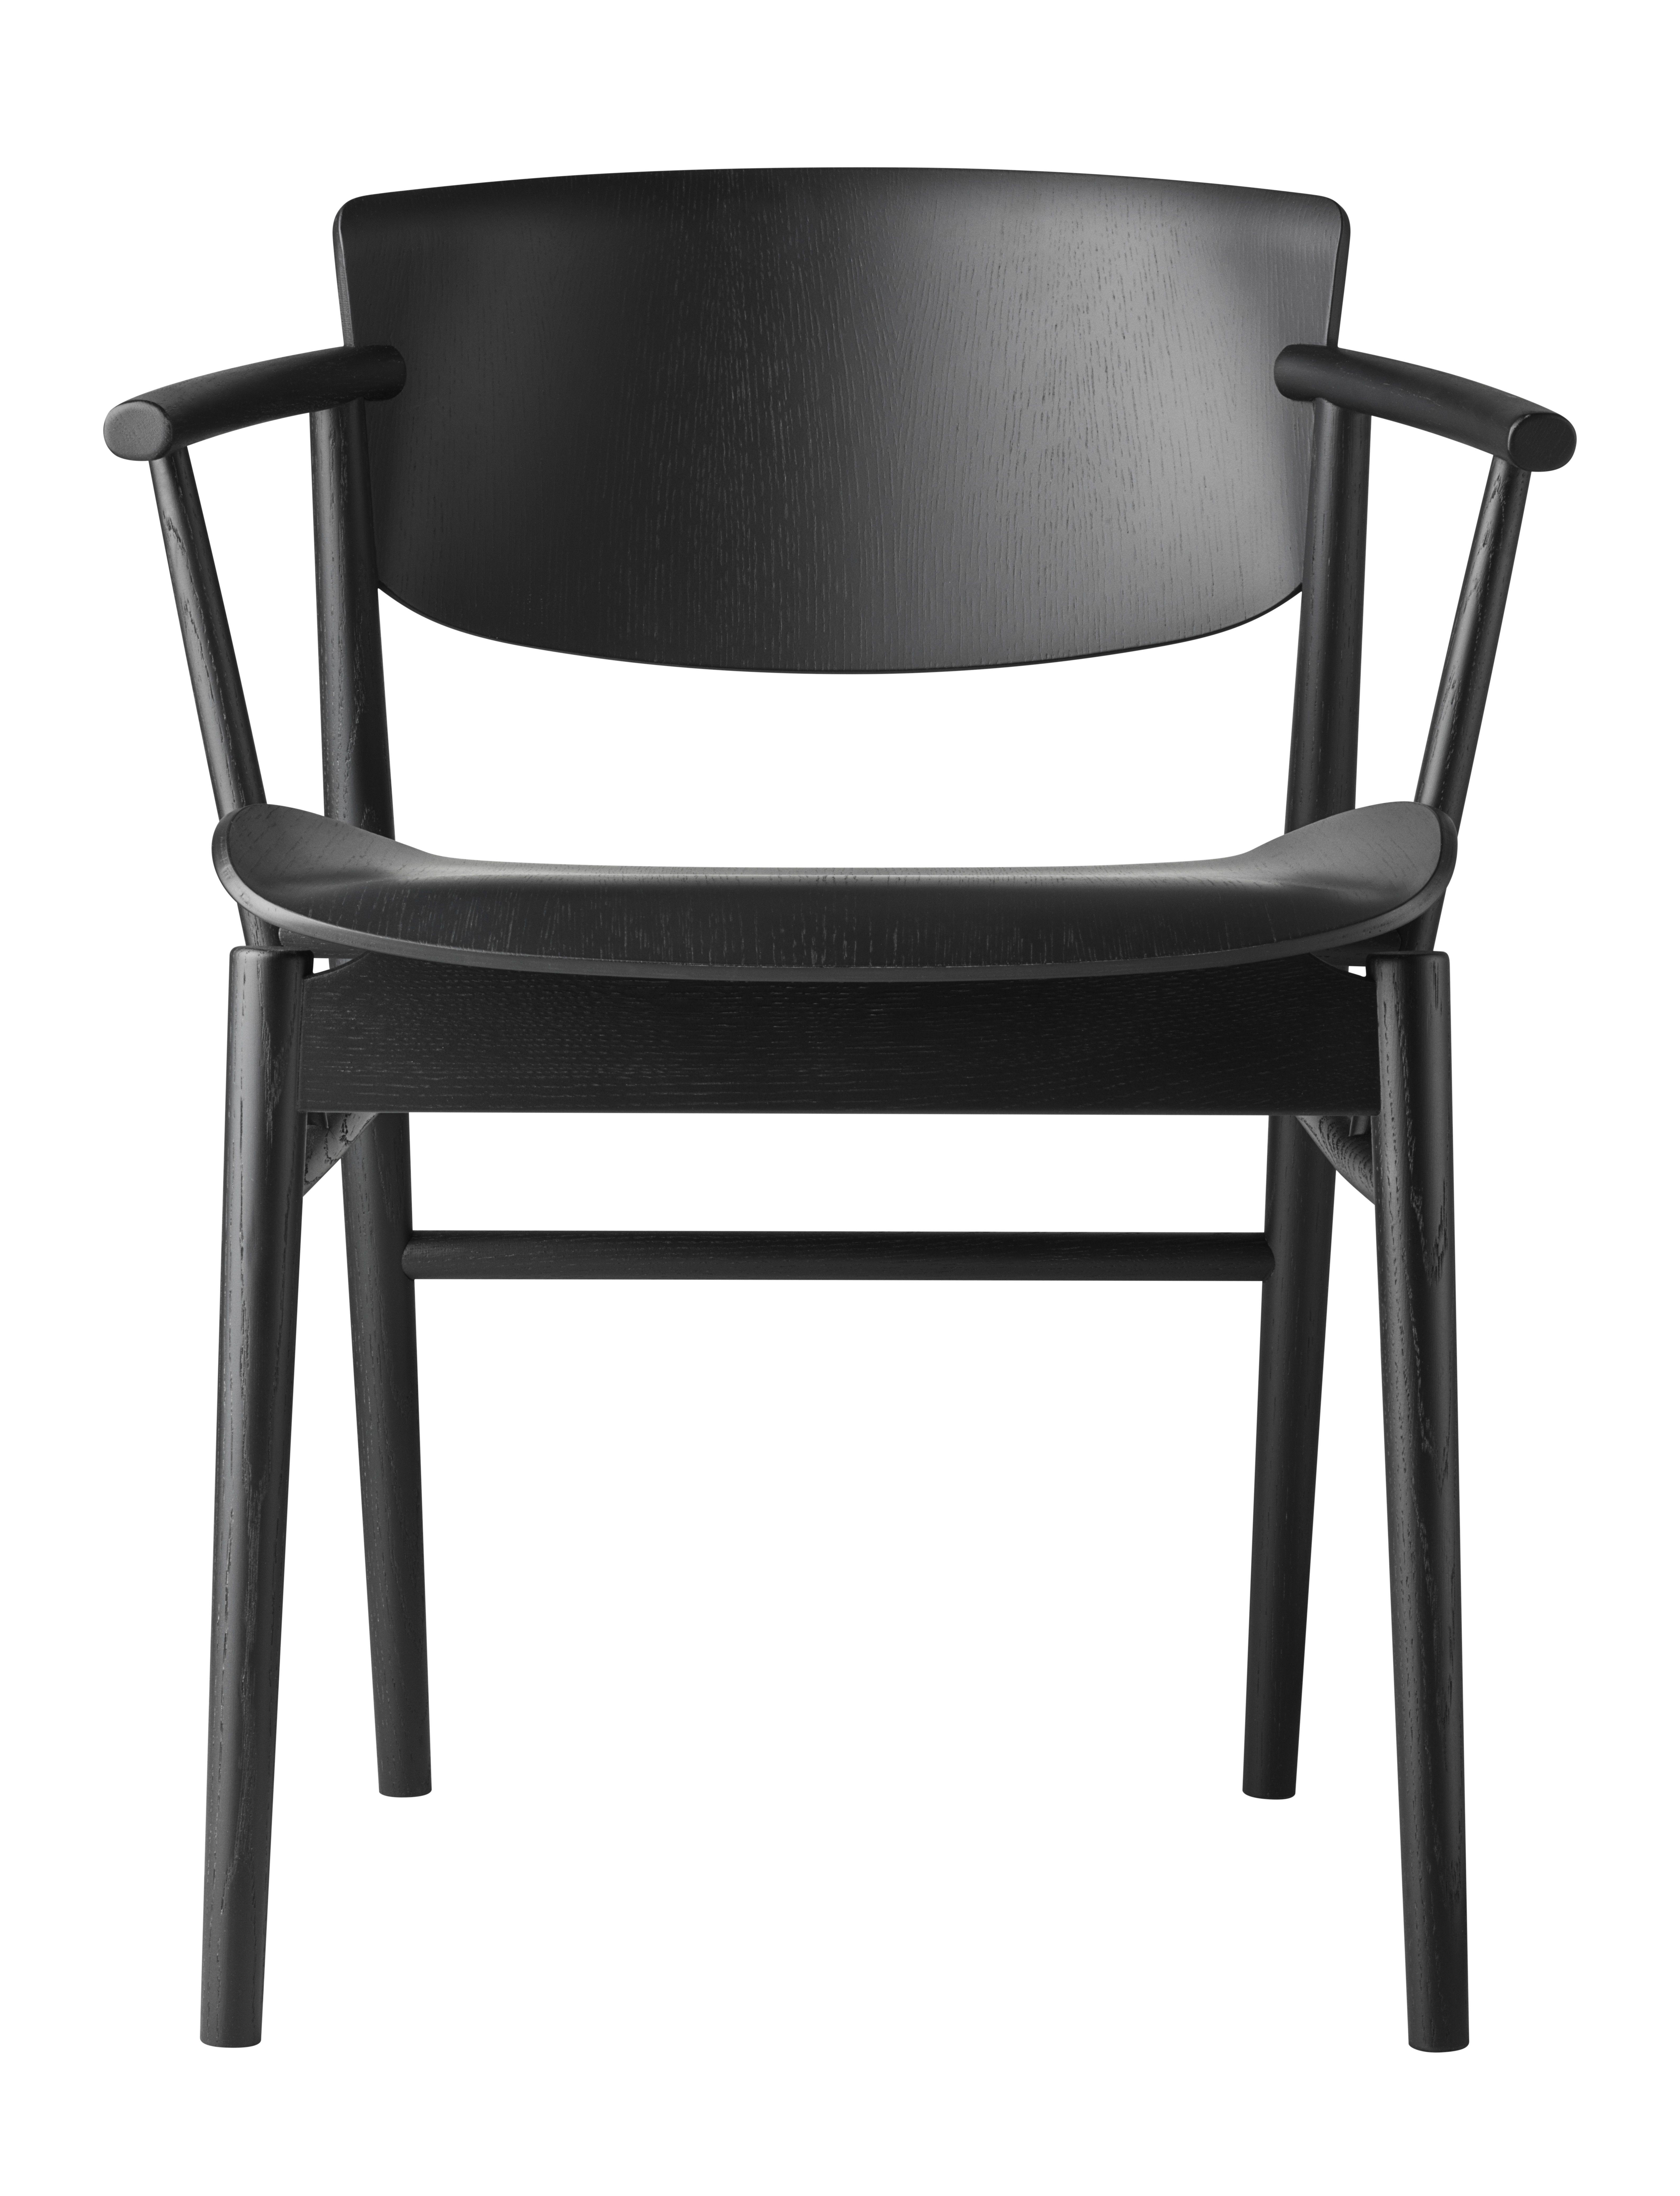 n01 chair by nendo for republicoffritzhansen chair danishdesign japaneseasthetic